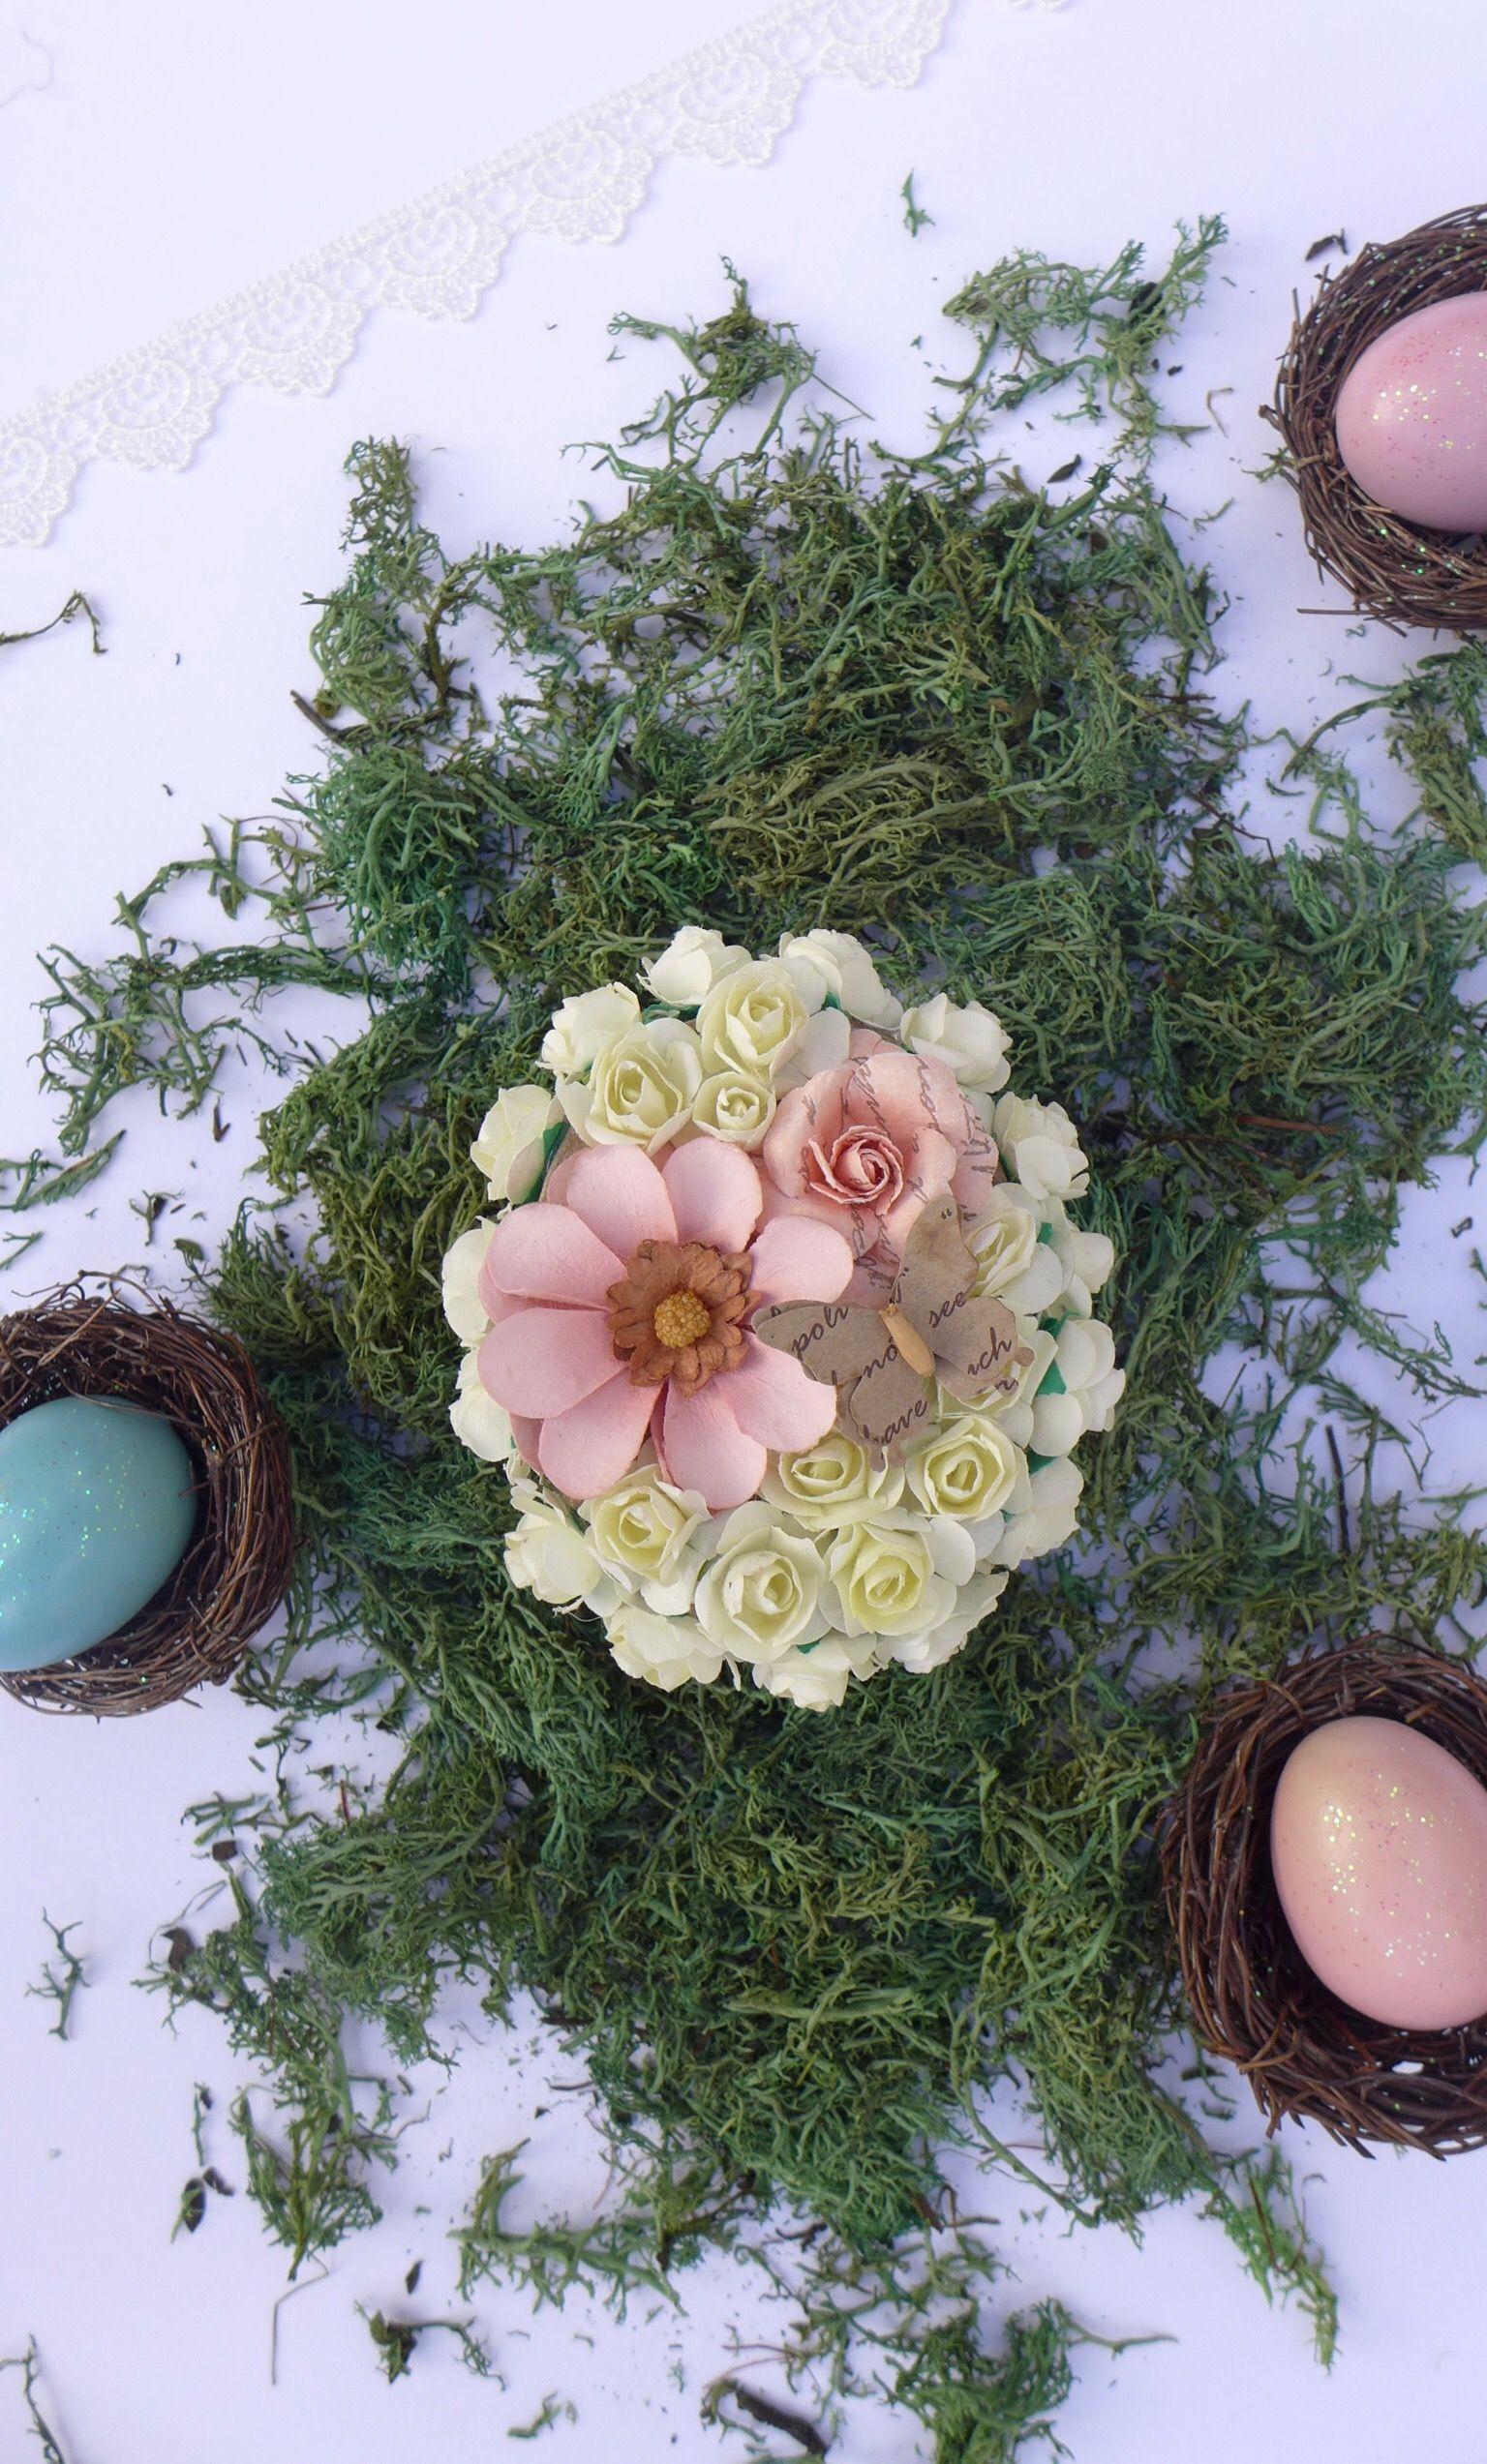 Easter bunny gift ideas easter bunny gift idea for kids easter easter bunny gift ideas easter bunny gift idea for kids easter gift girl negle Images